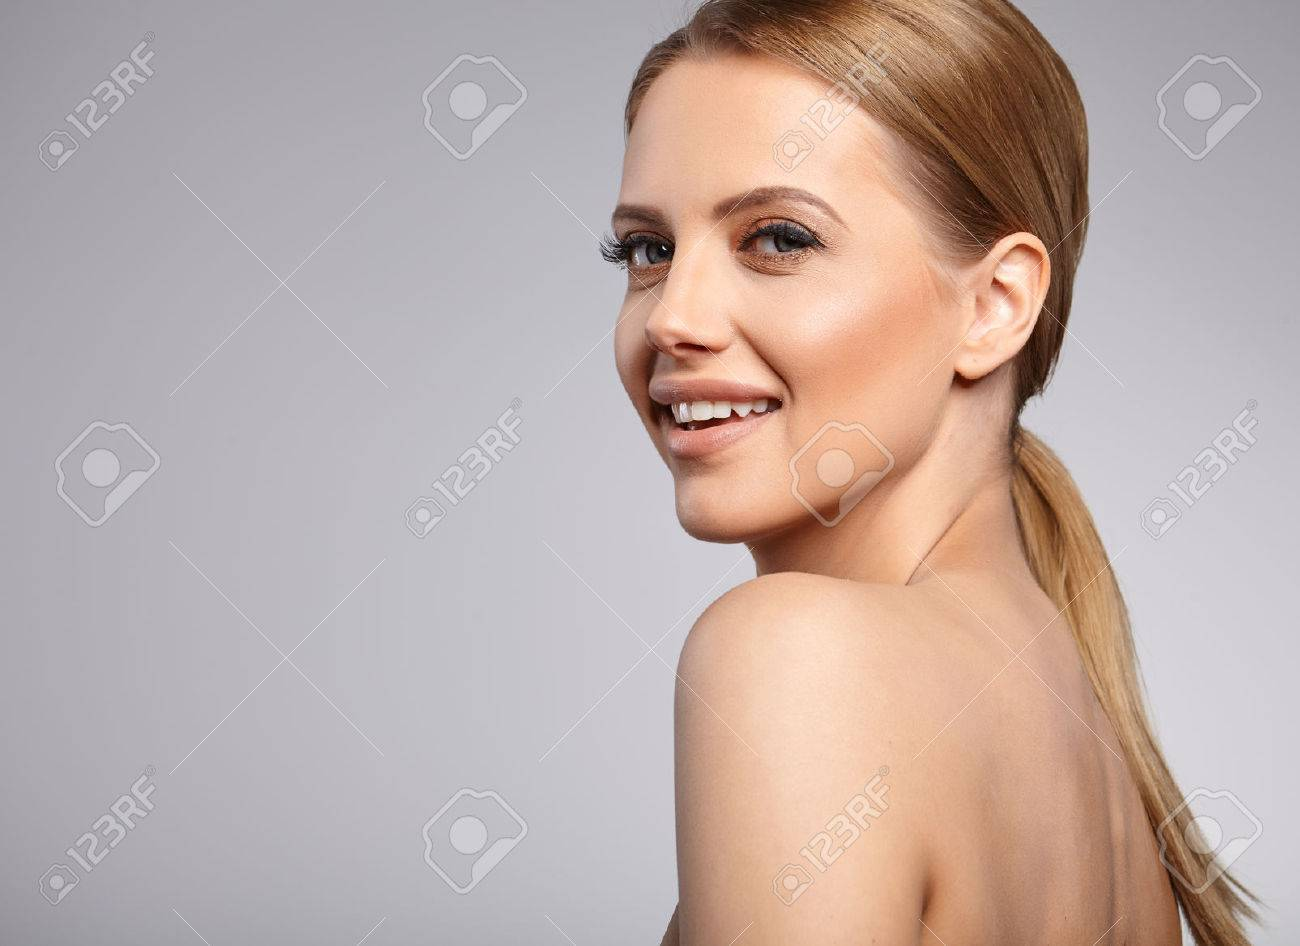 Beautiful Woman with Perfect Fresh Skin. - 45964281